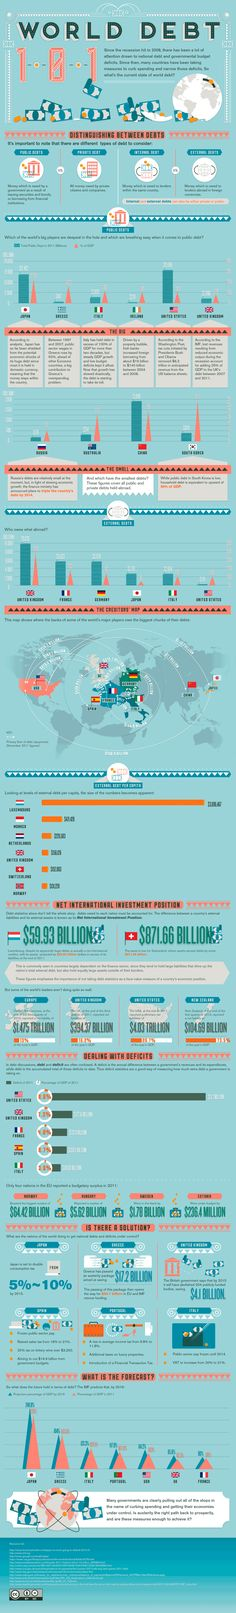 World Debt Infographic